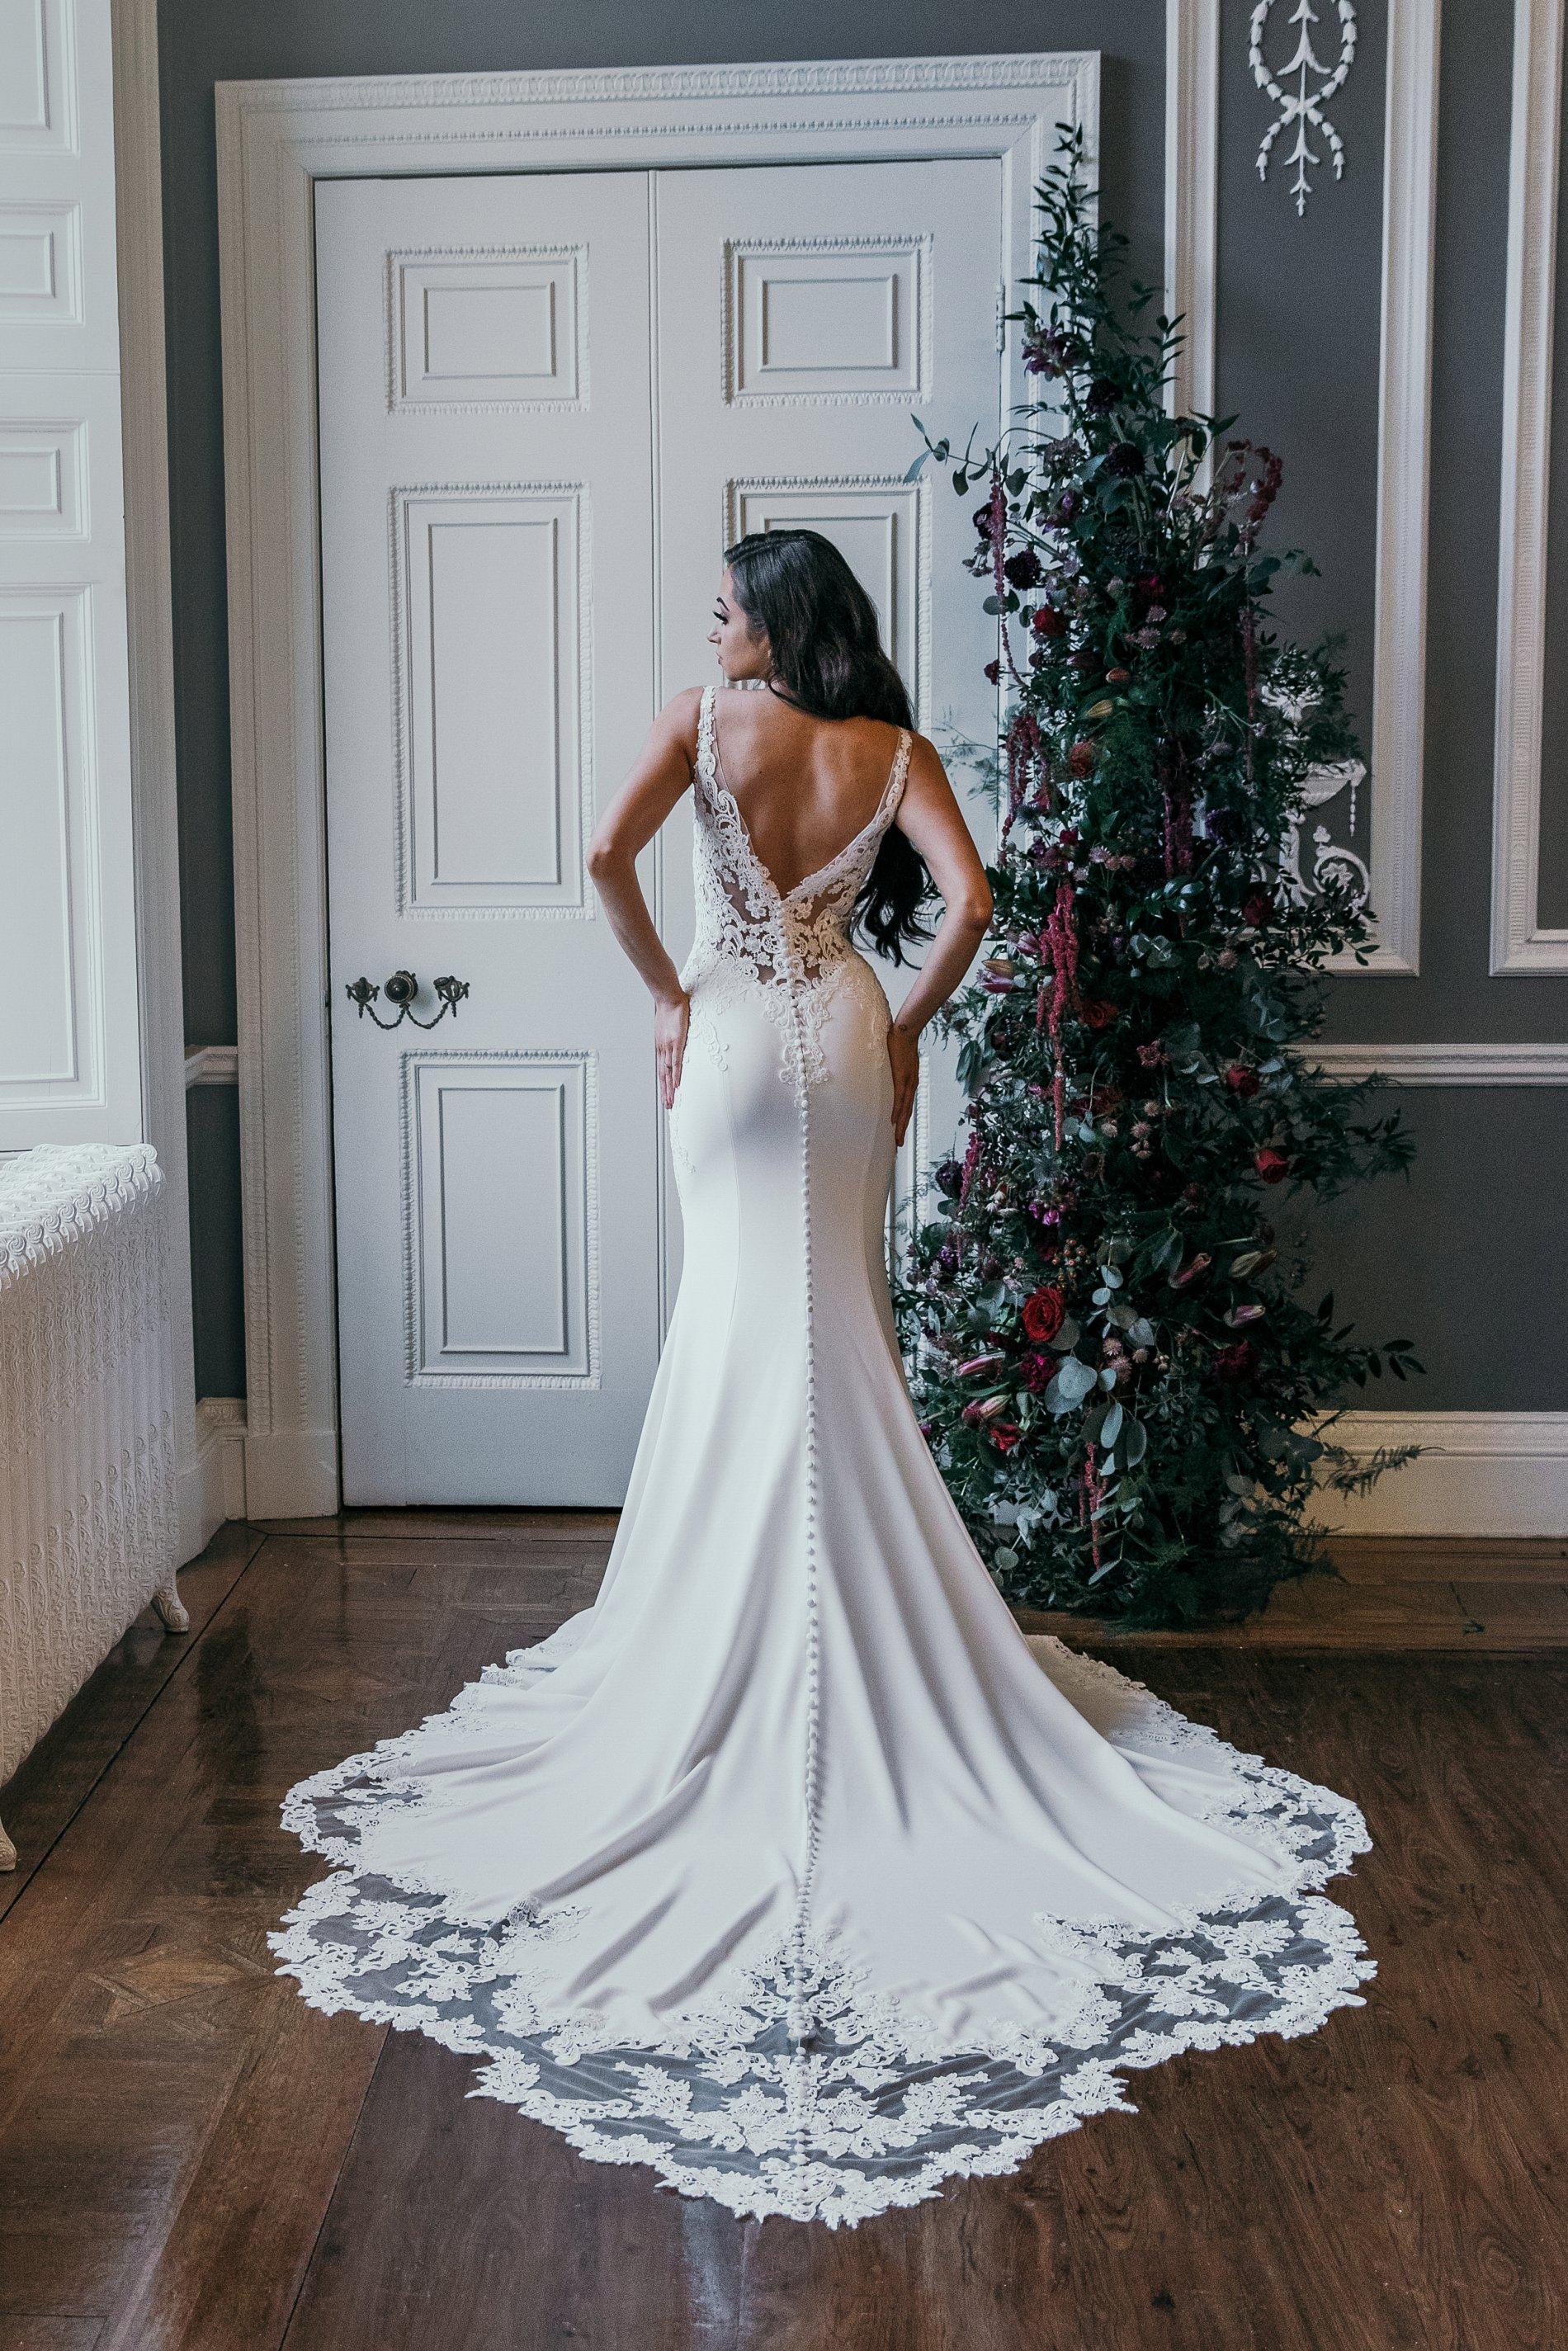 A Black Tie Wedding Creative Shoot at Saltmarshe Hall (c) Natalie Hamilton Photography (21)